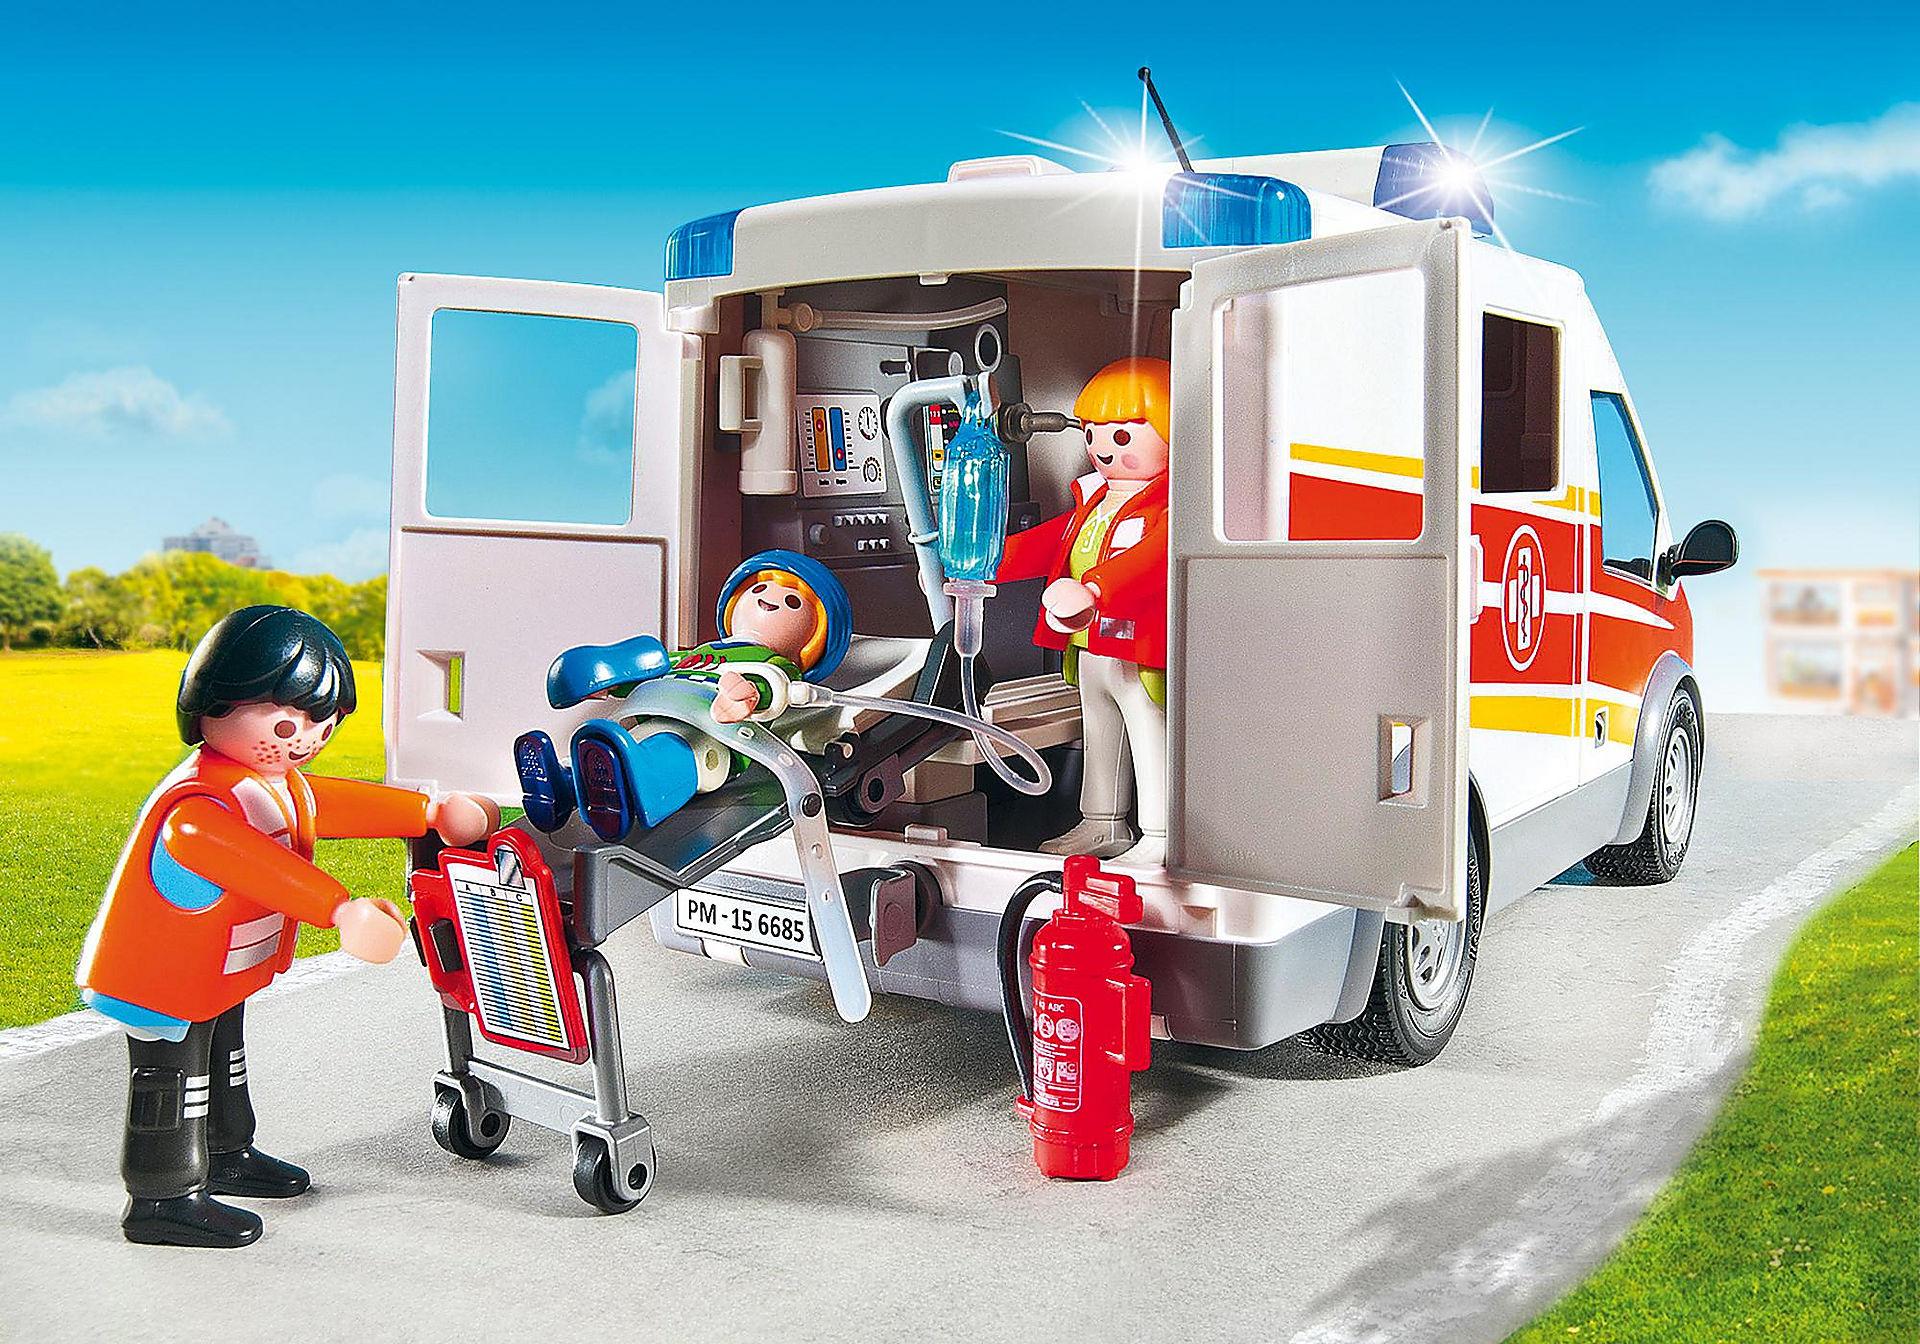 http://media.playmobil.com/i/playmobil/6685_product_extra2/Ambulancia con Luces y Sonido